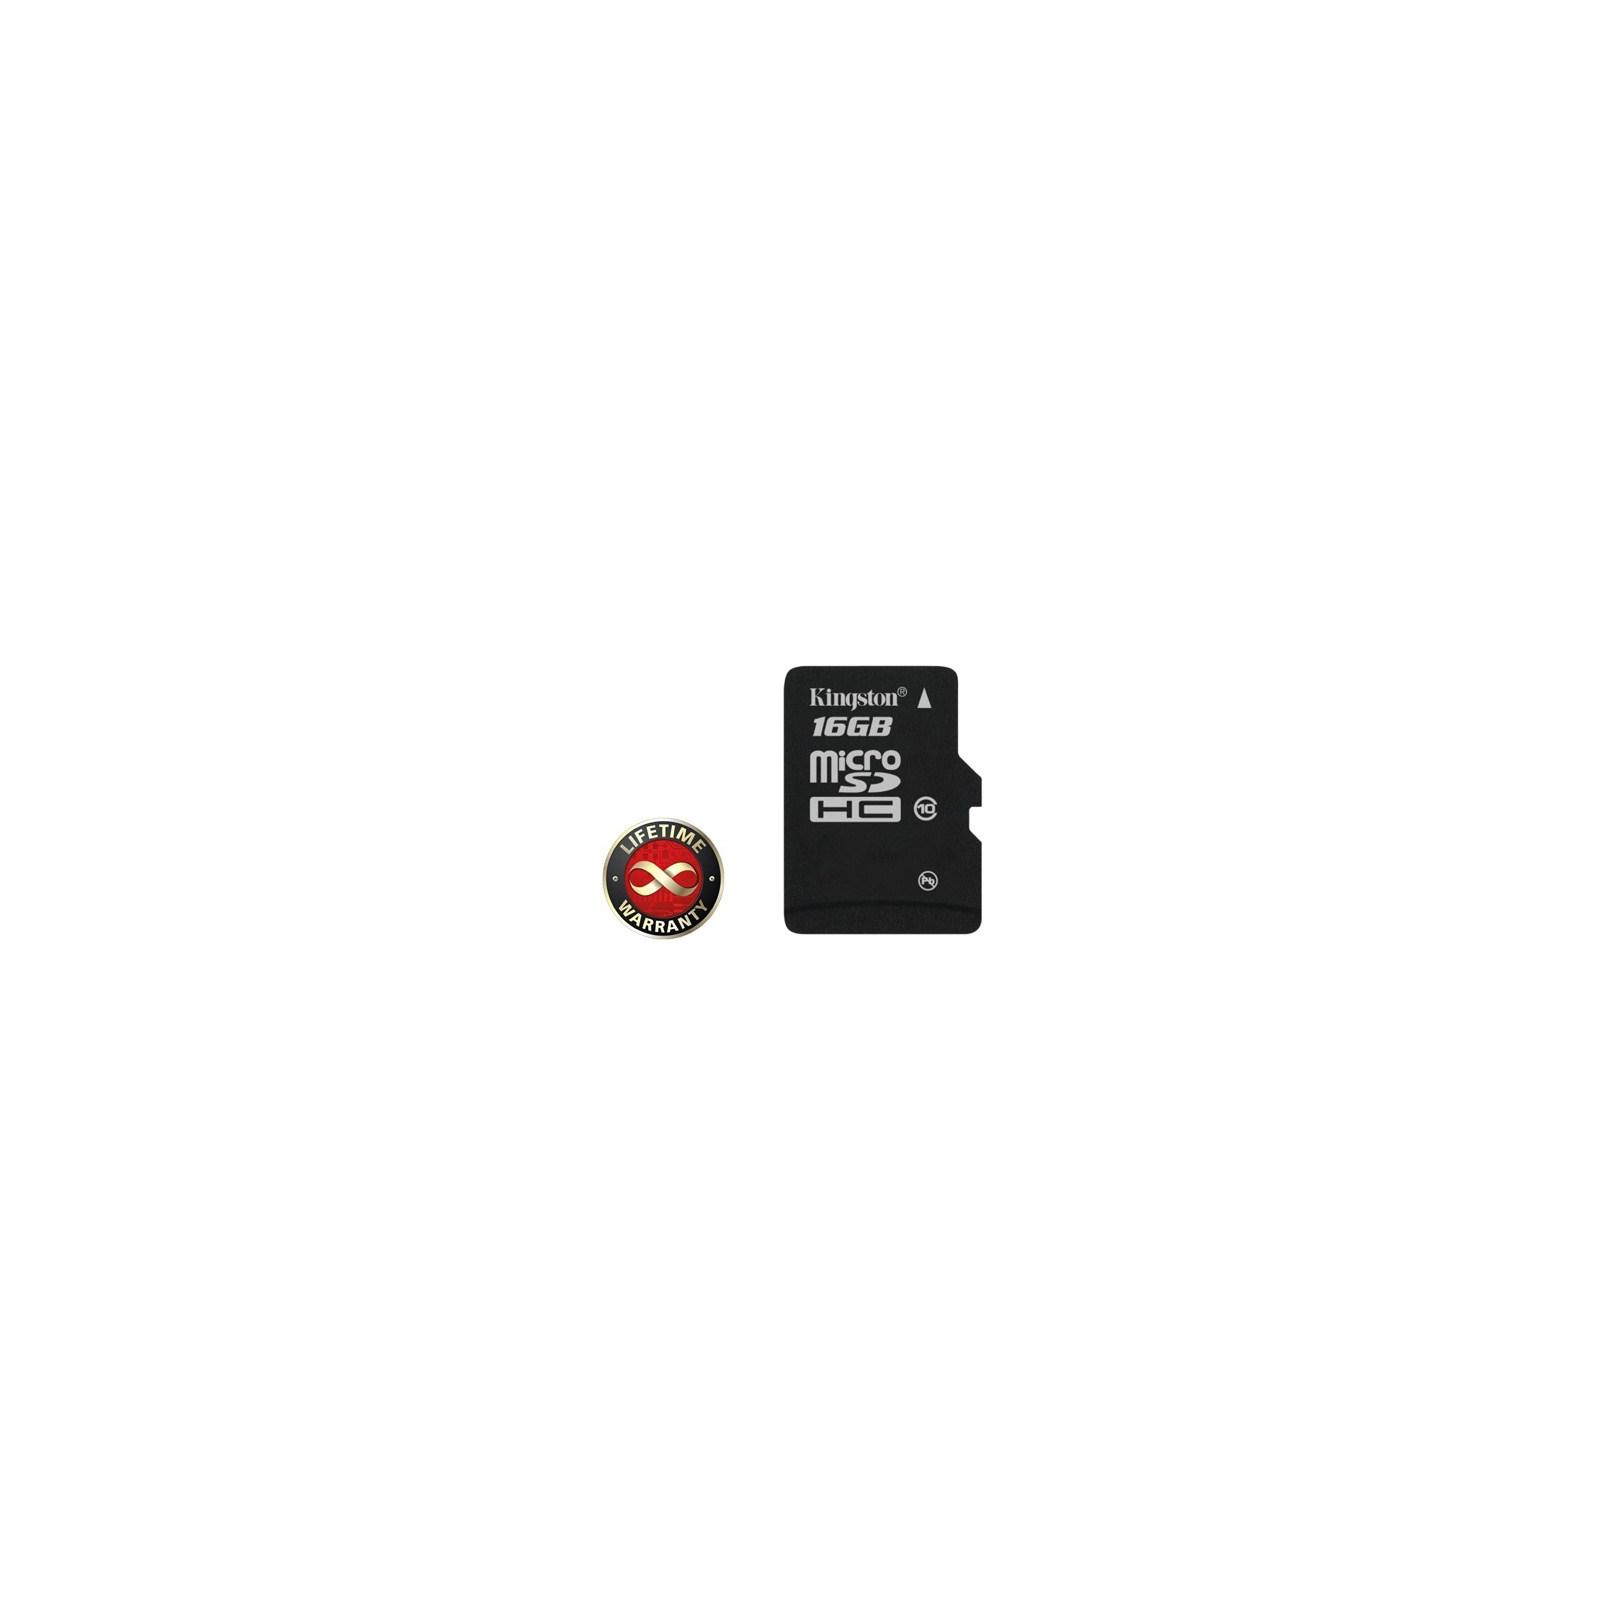 Карта памяти Kingston 16Gb microSDHC class 10 (SDC10/16GBSP)